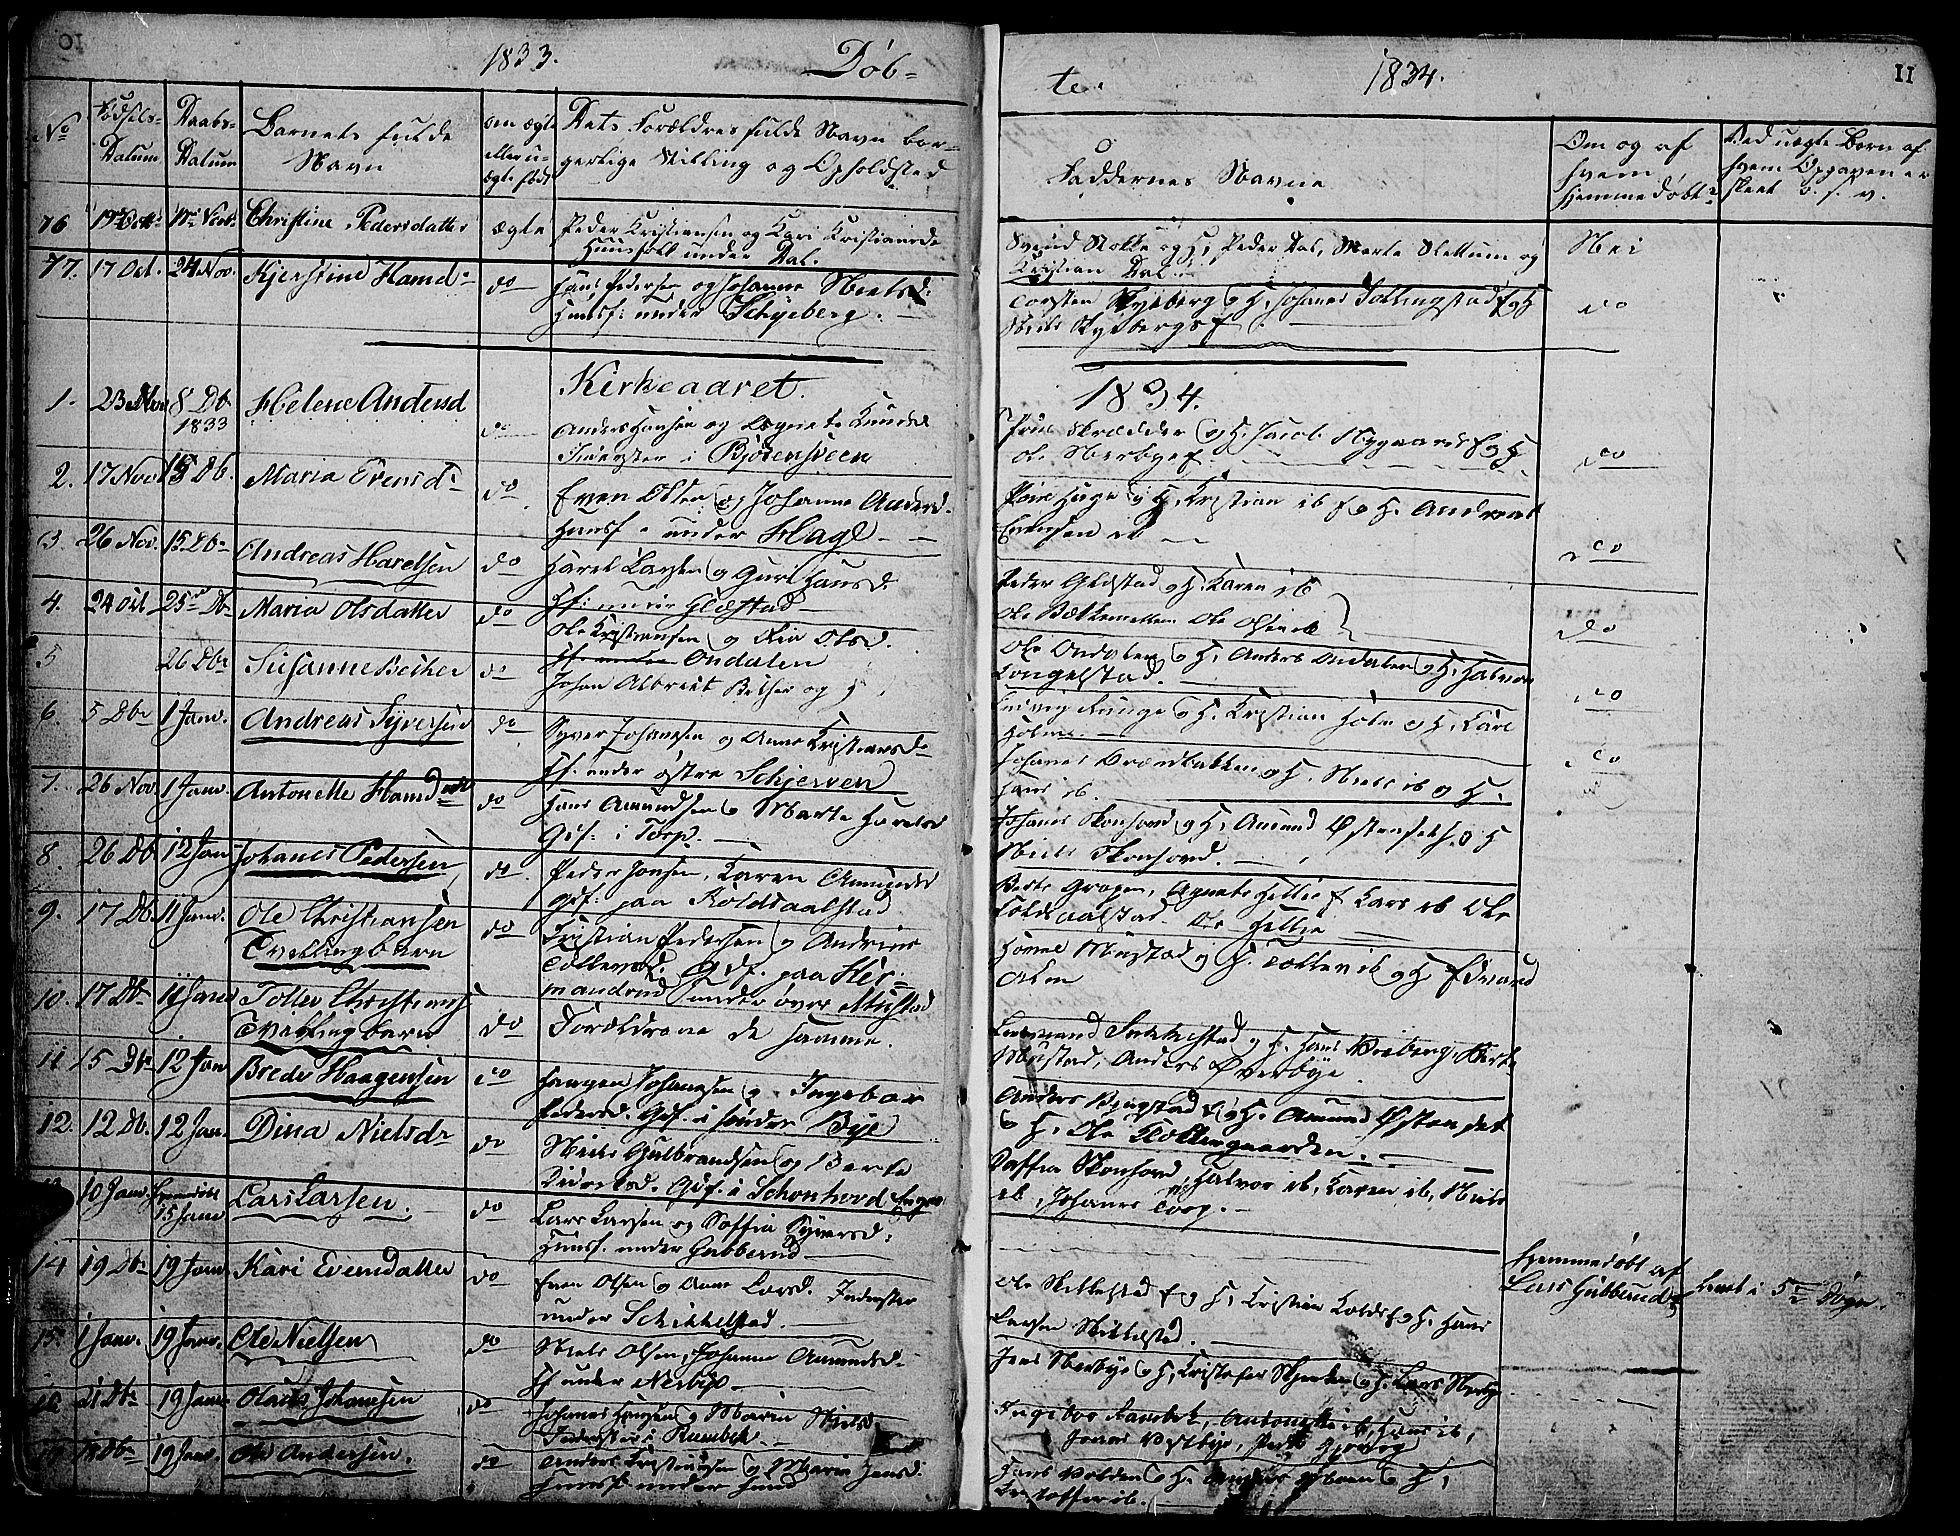 SAH, Vardal prestekontor, H/Ha/Hab/L0004: Klokkerbok nr. 4, 1831-1853, s. 11